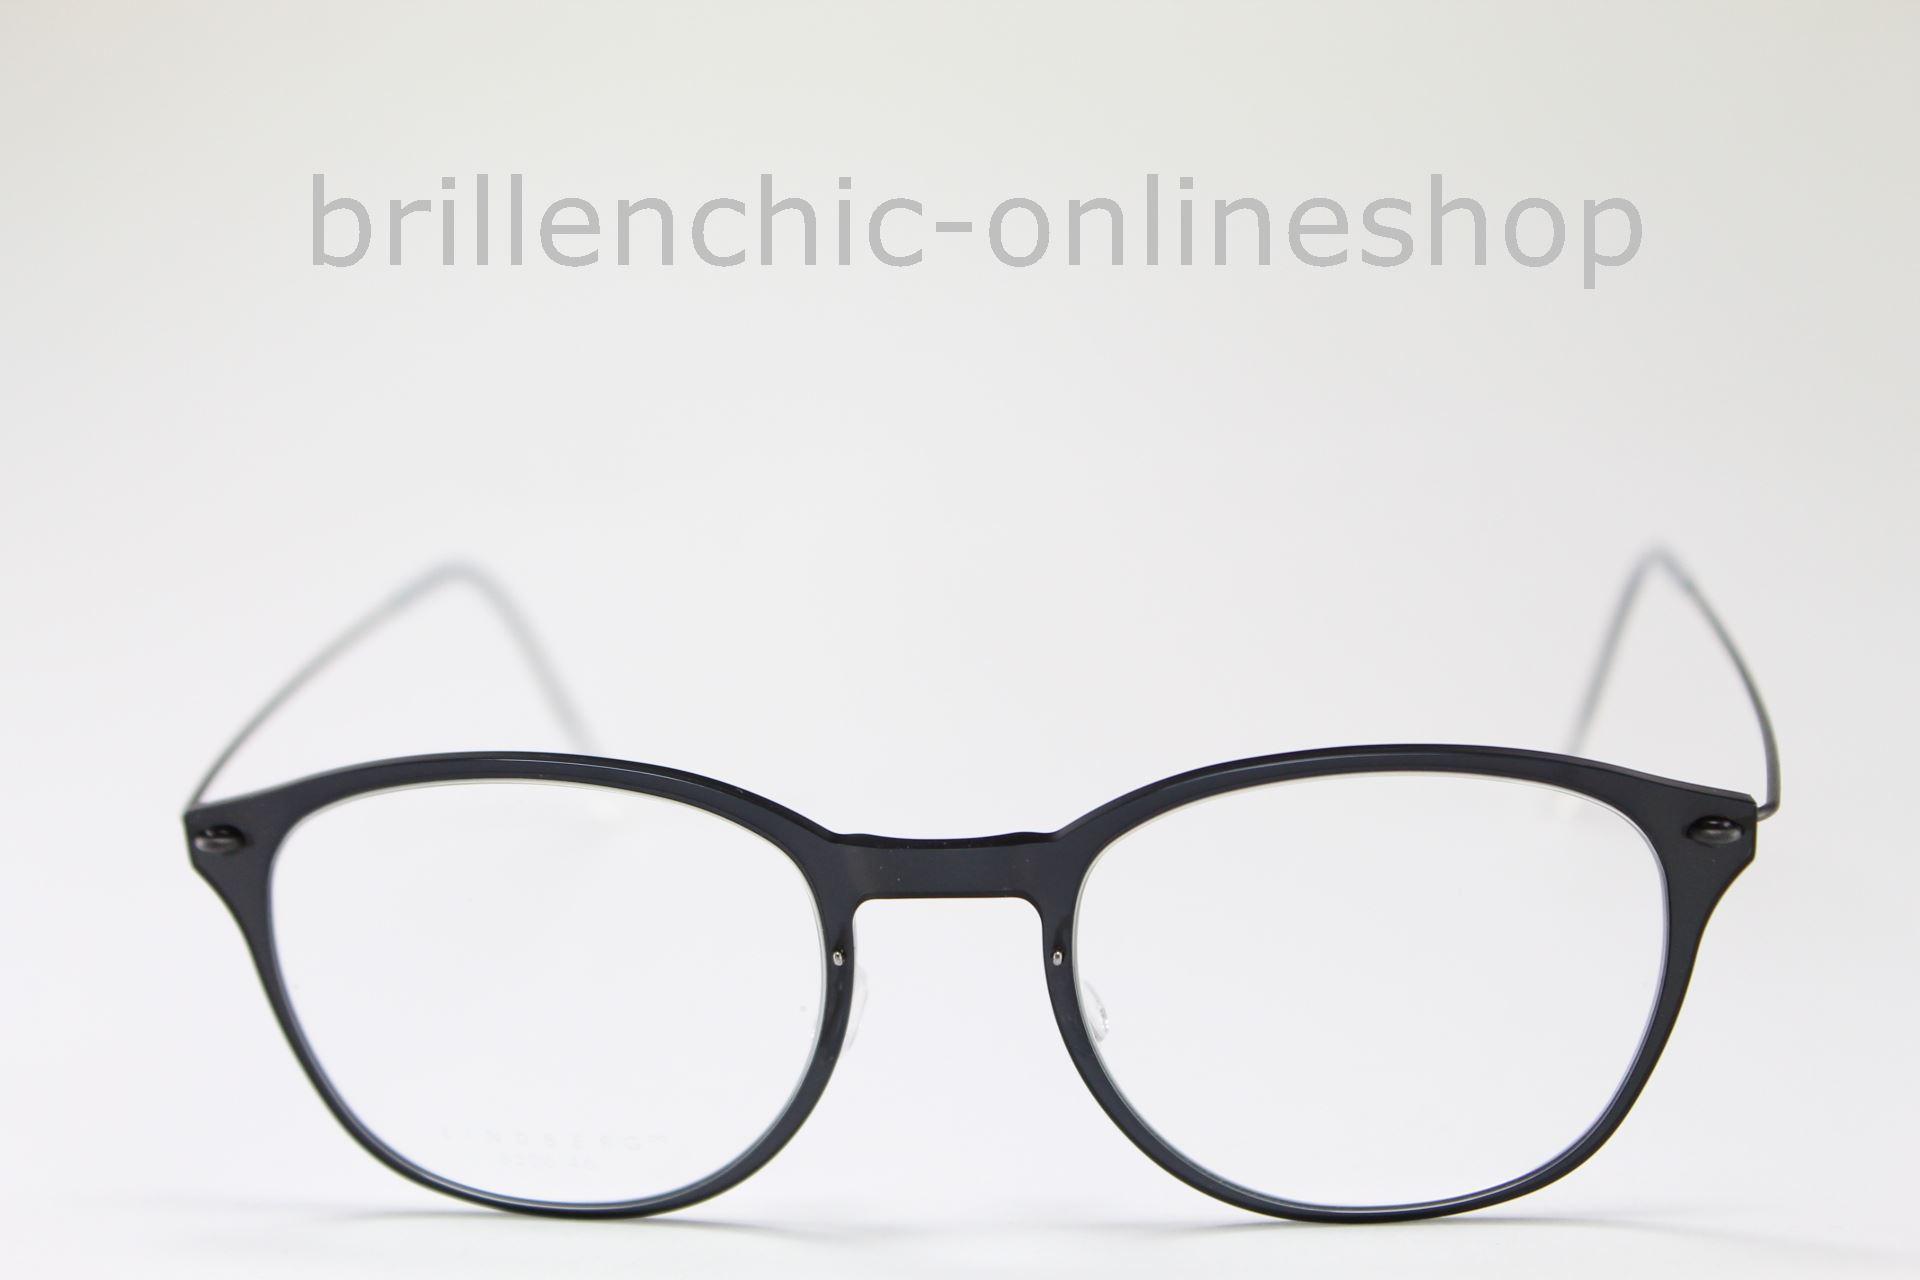 f2fd66f1ca7b Brillenchic-onlineshop in Berlin - LINDBERG NOW 6506 C06 U9 TITANIUM ...